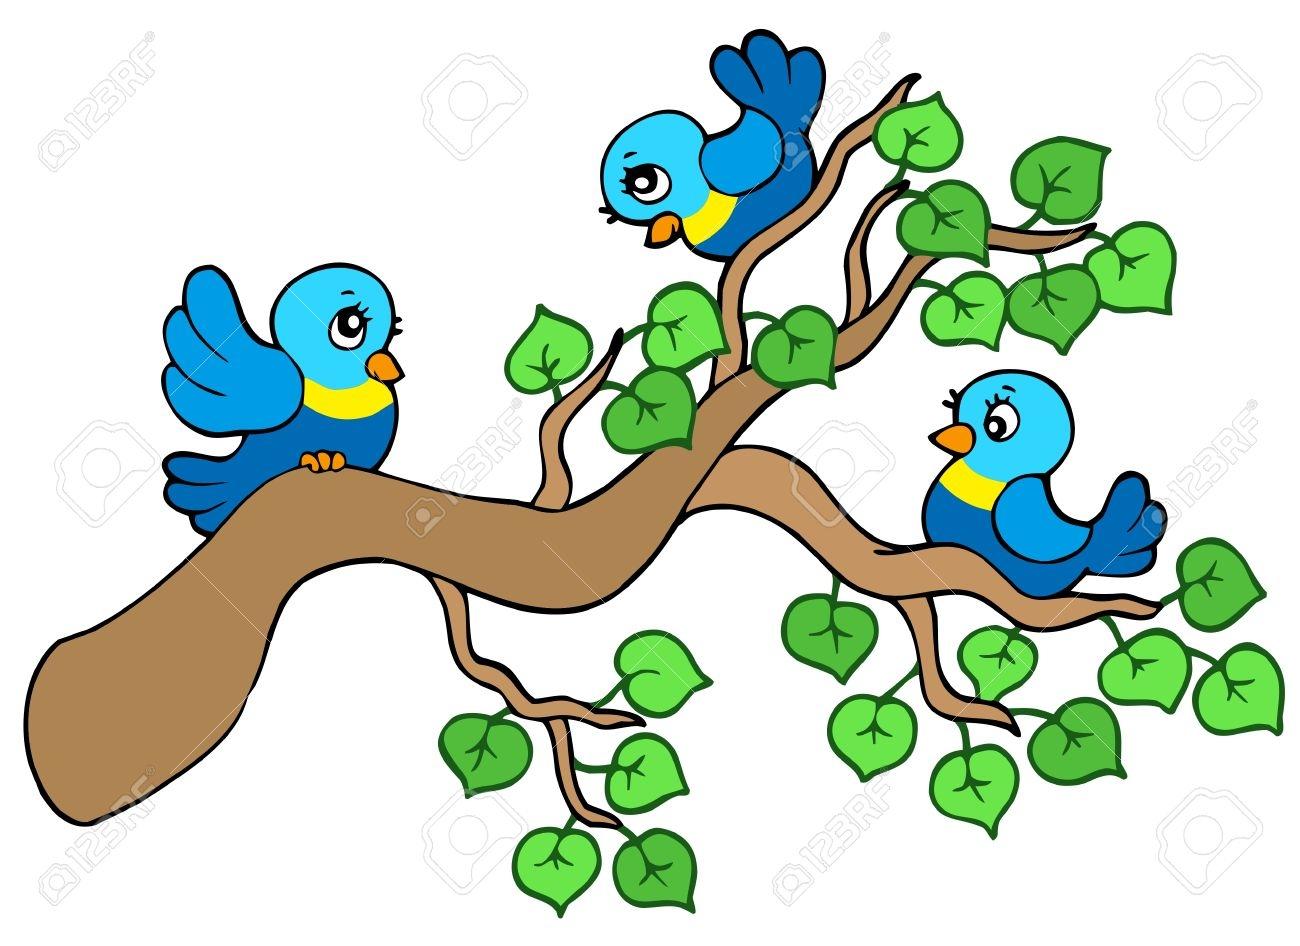 New design digital collection. Birds clipart branch